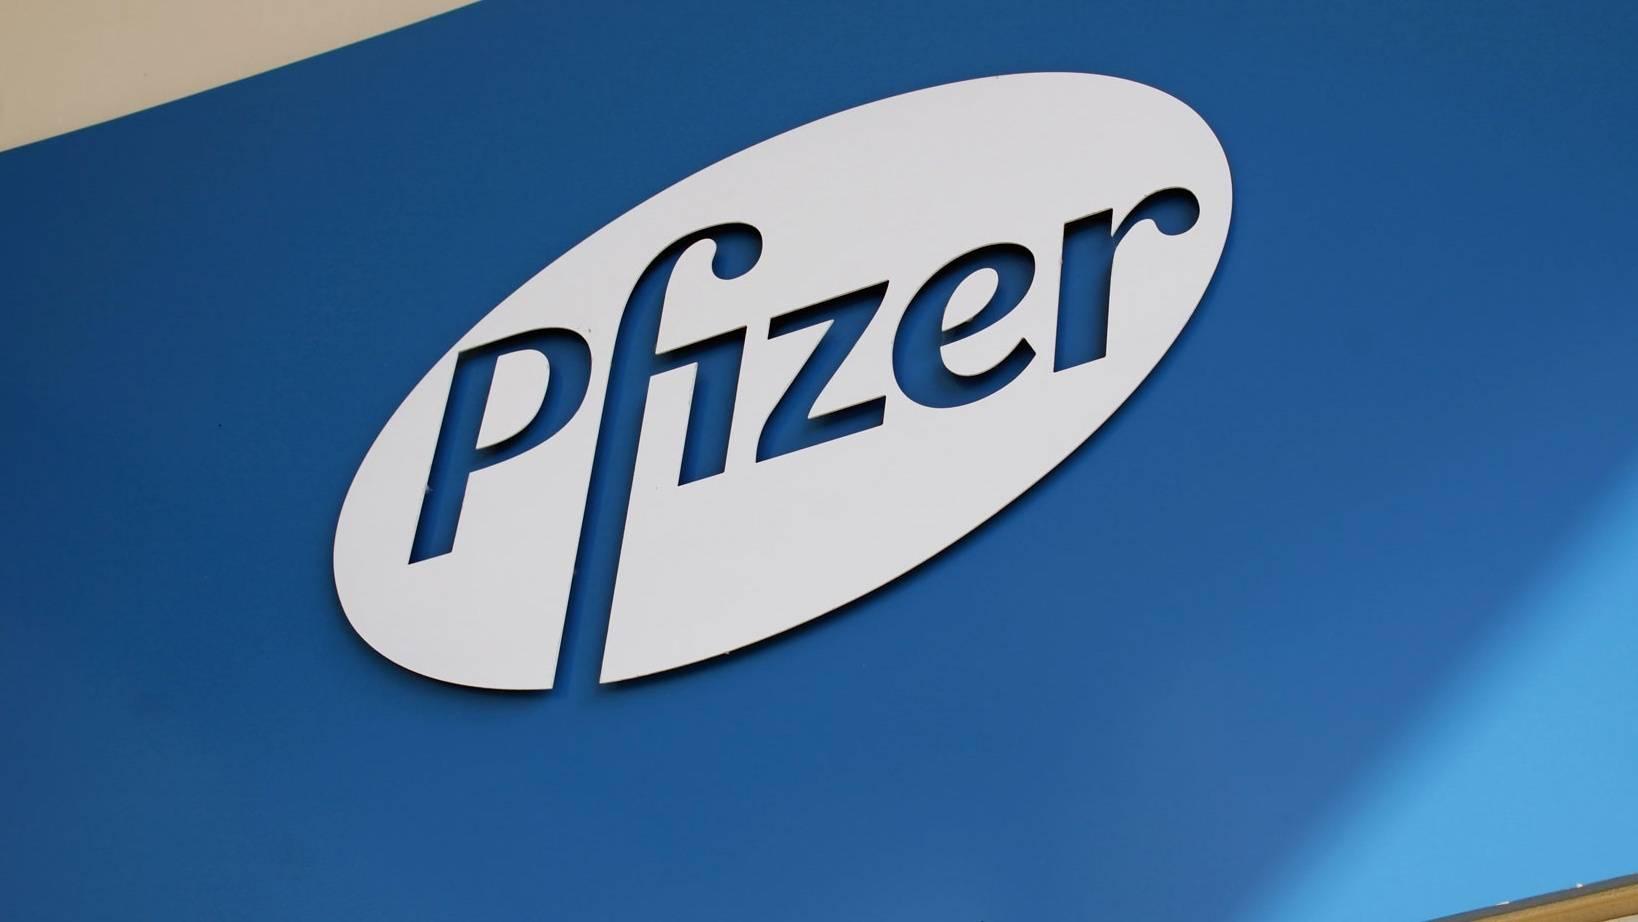 Pfizer to create 130 new jobs - Cork's RedFM